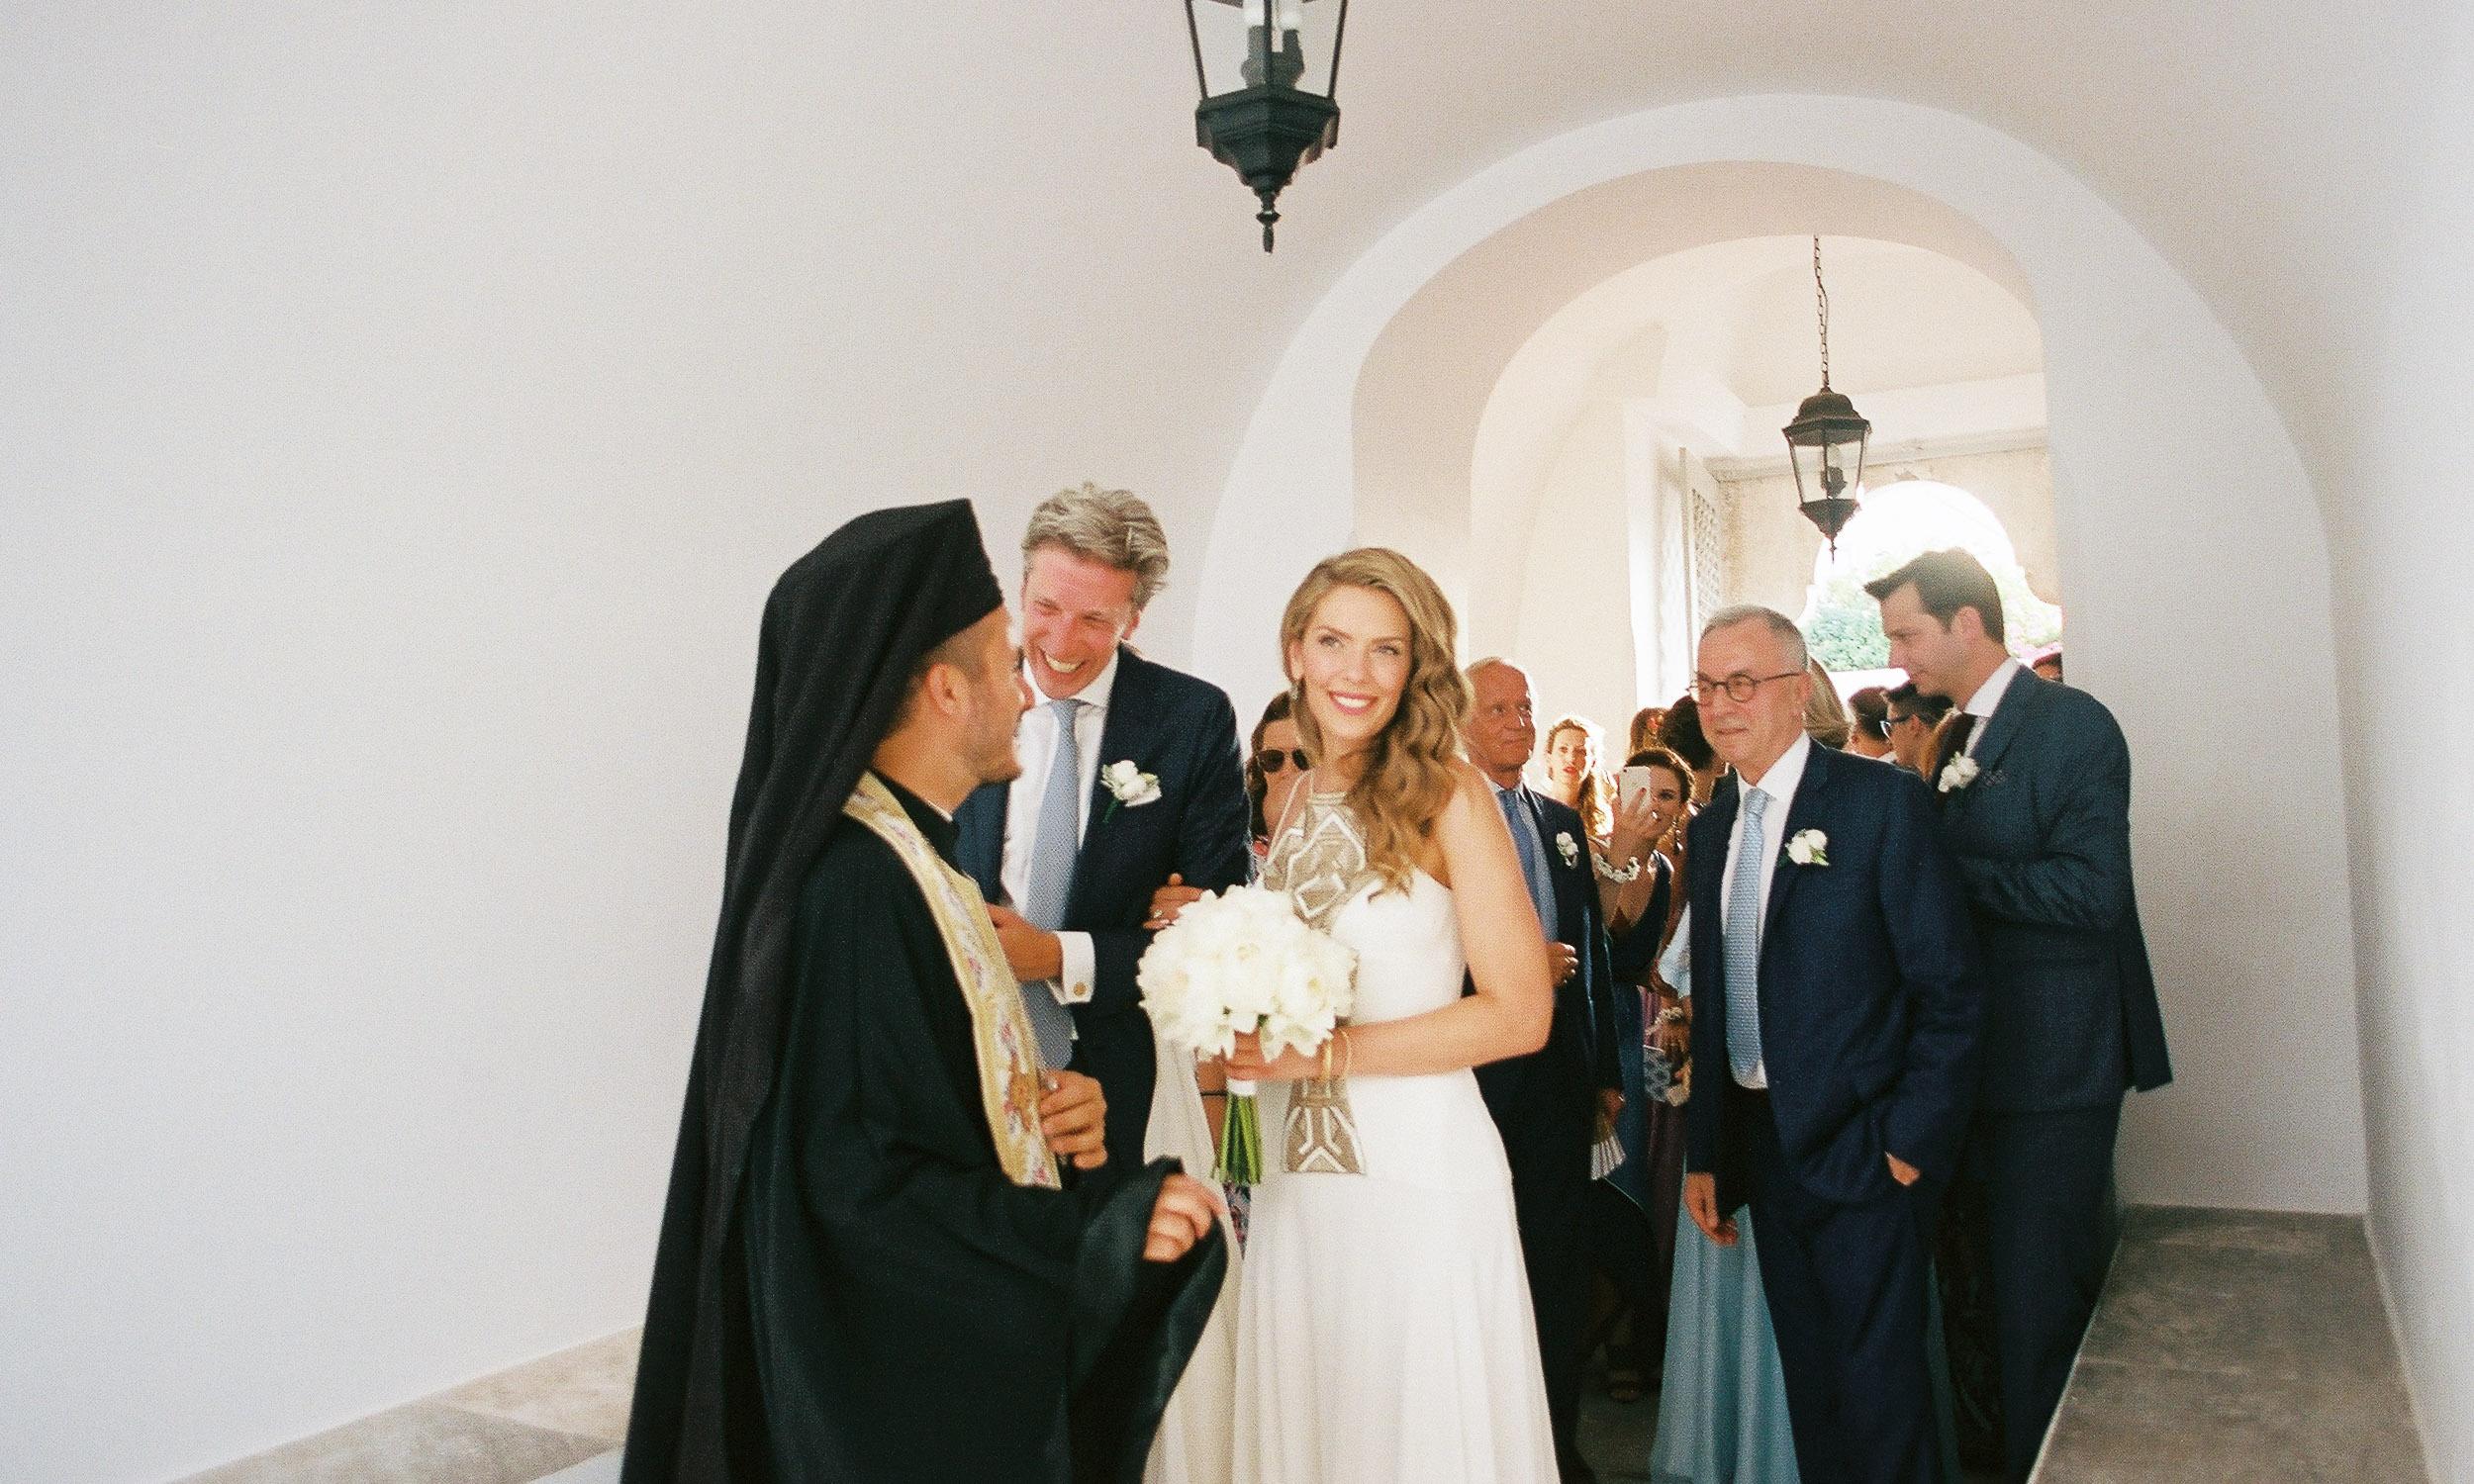 Elegant wedding film photography in Spetses island Greece